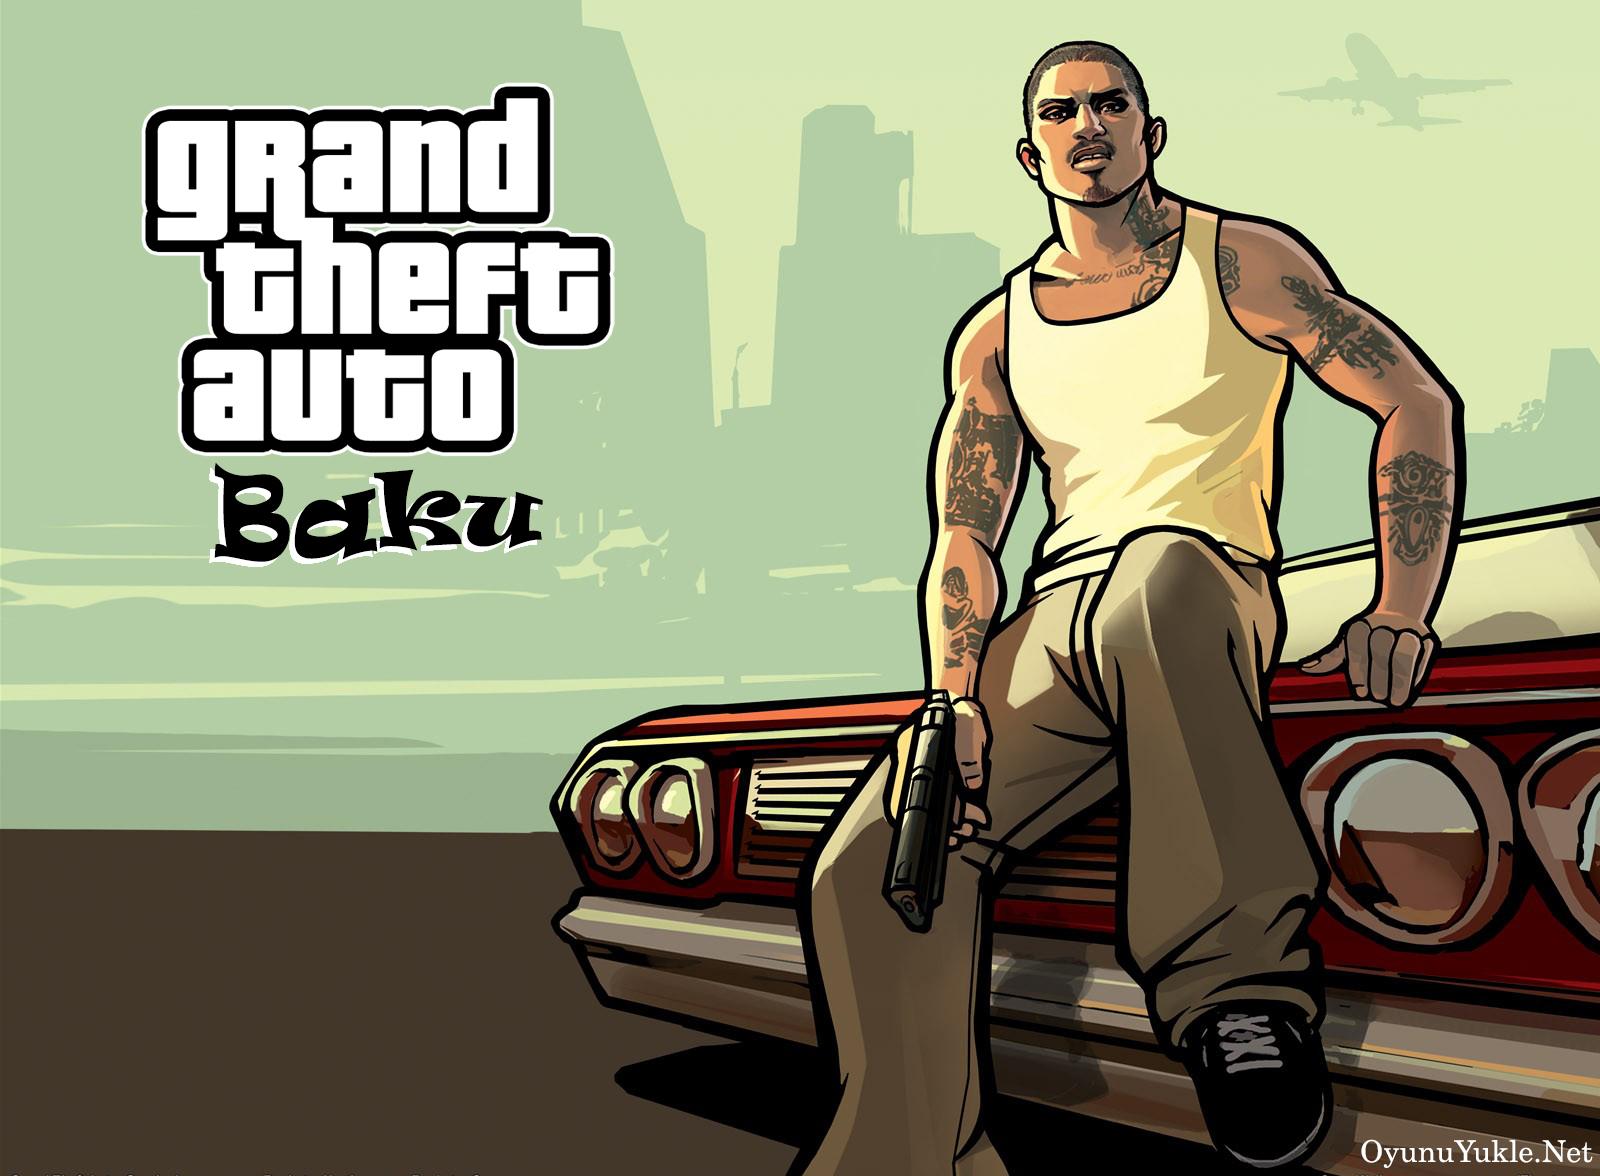 Gta San Andreas Baku Mod Yukle Oyunu Yukle Autos Post